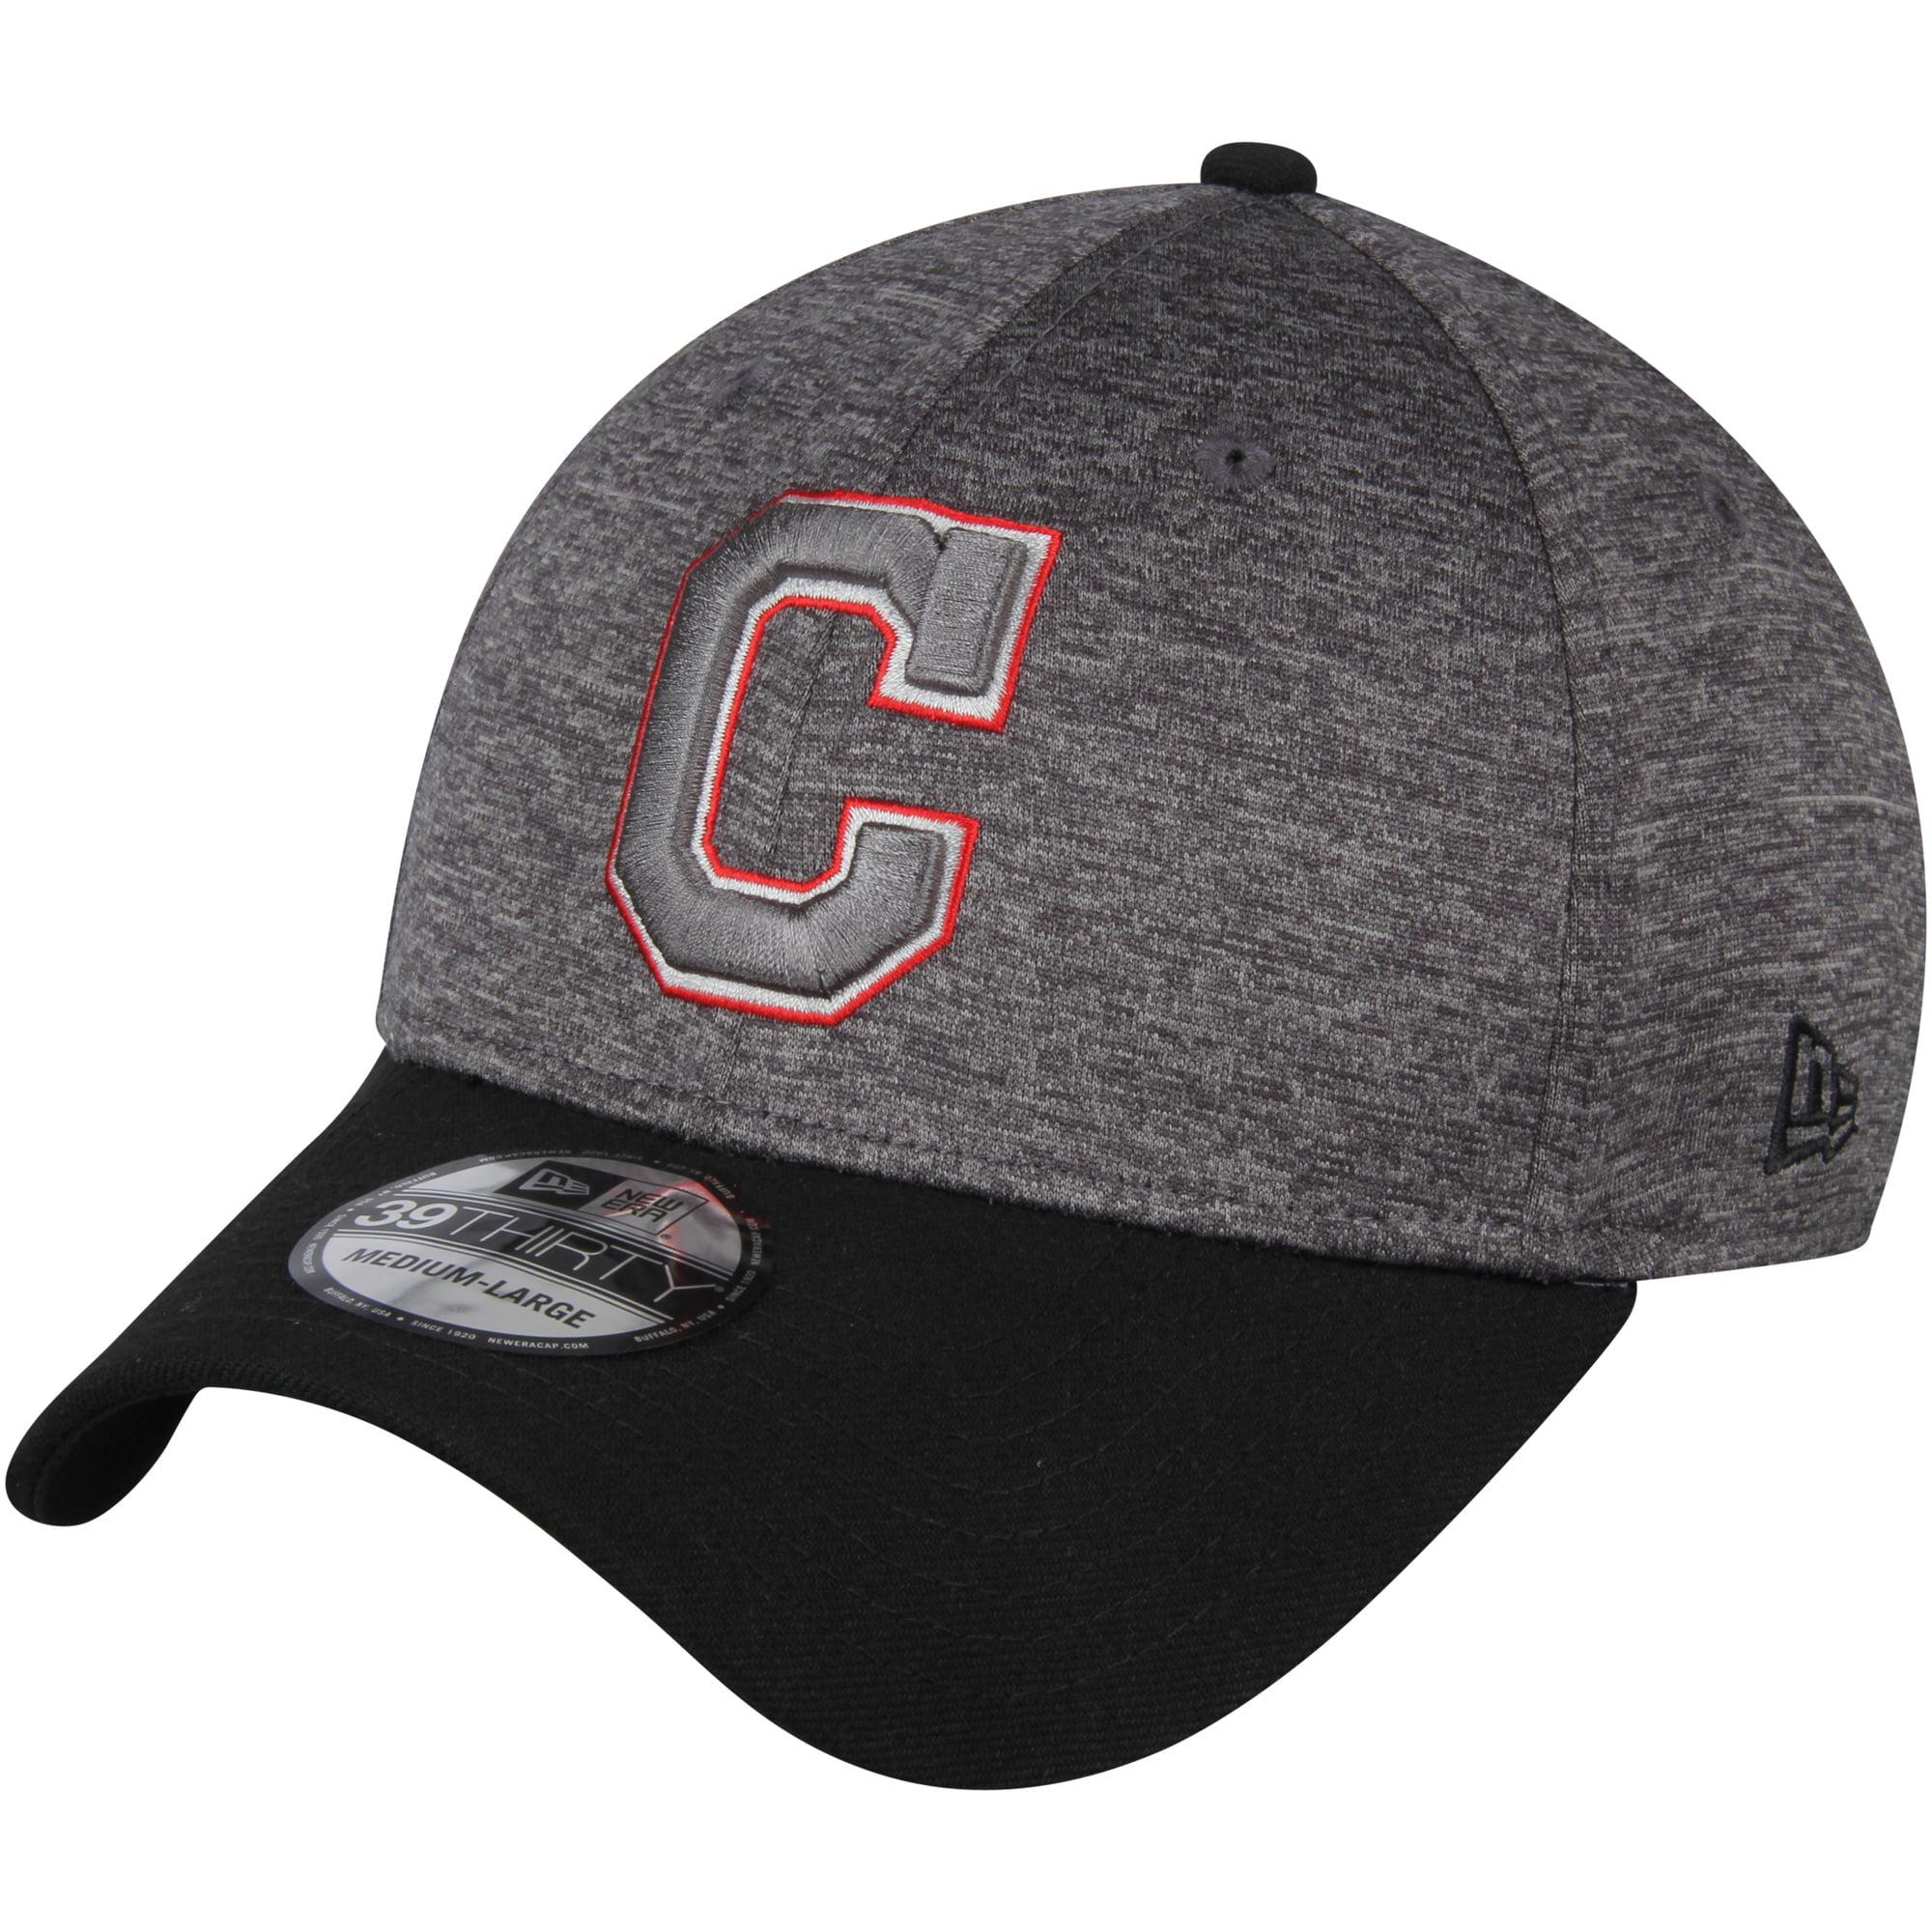 Cleveland Indians New Era 39THIRTY Shadow Tech Color Pop Flex Hat - Heathered Gray/Black